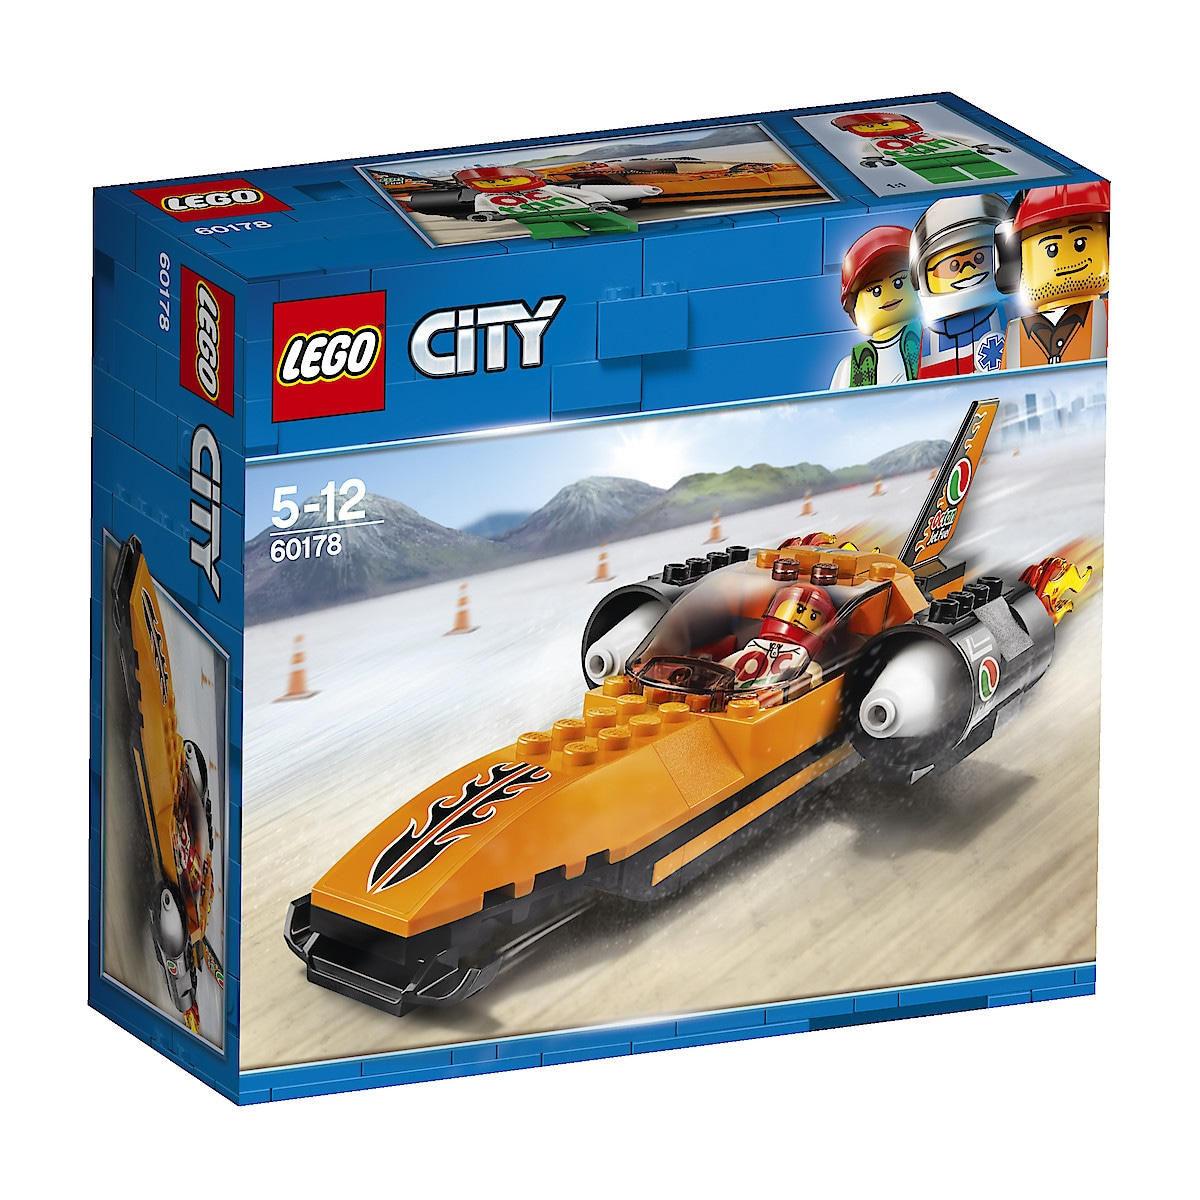 LEGO City Great Vehicles 60178, superraskt kjøretøy